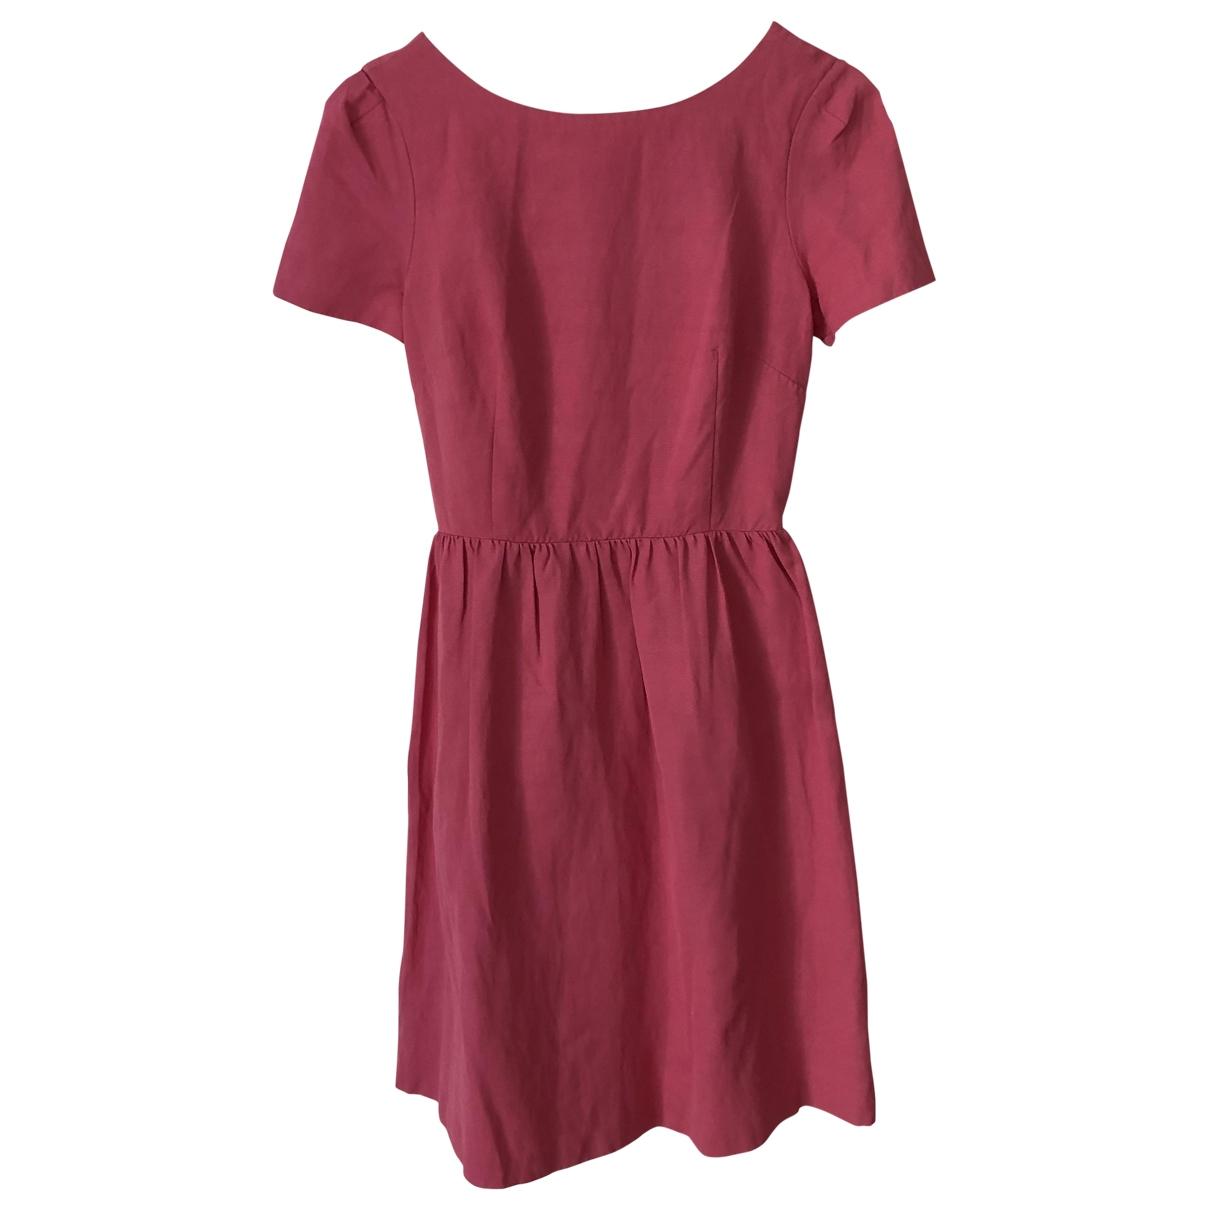 Tara Jarmon \N Pink dress for Women One Size IT